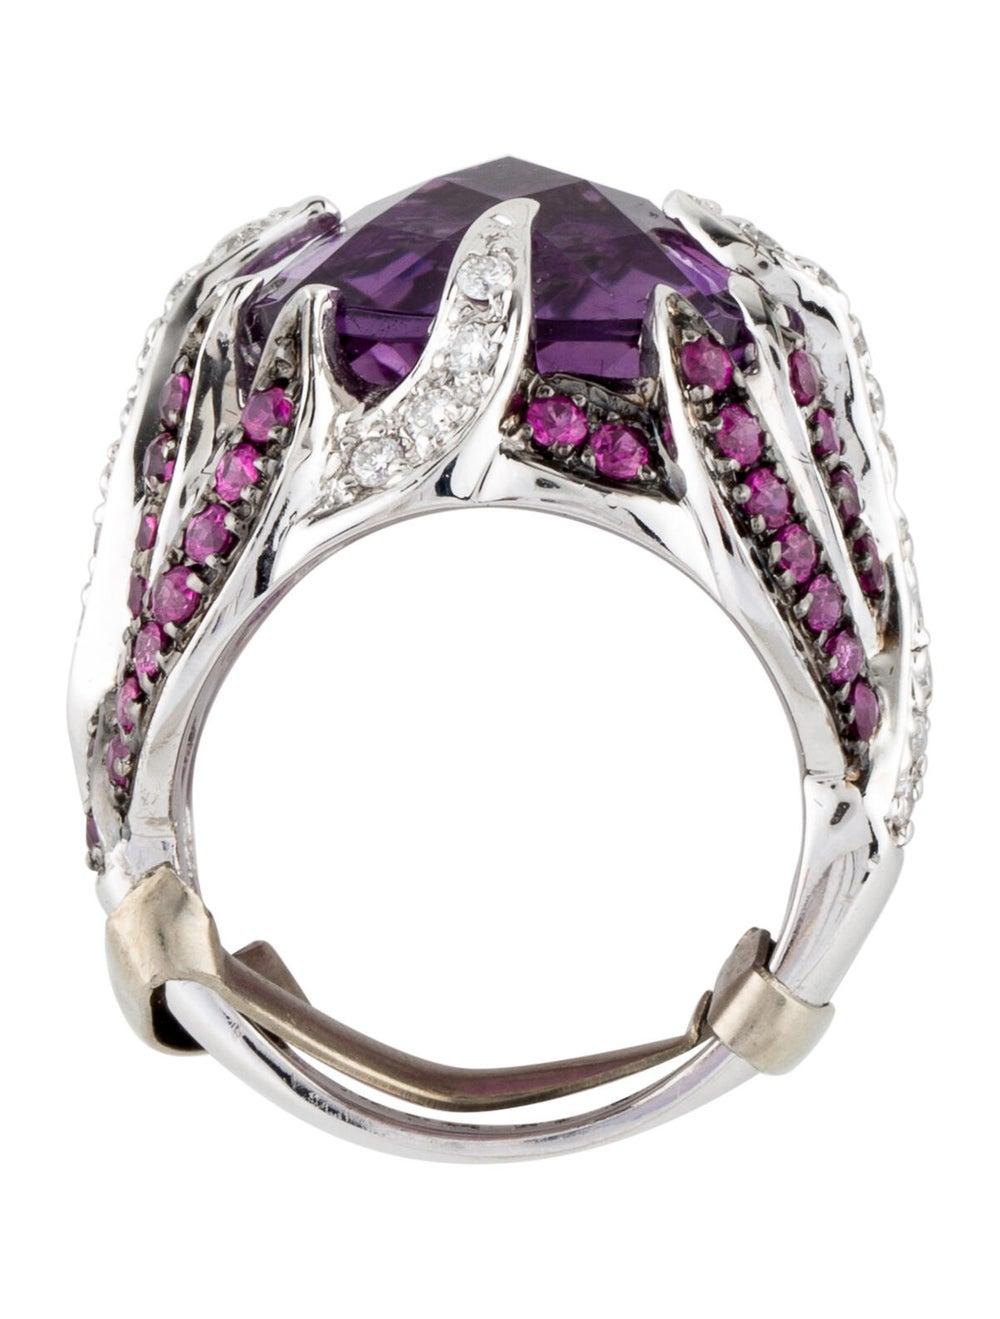 Ring 14K Amethyst, Ruby & Diamond Cocktail Ring S… - image 5